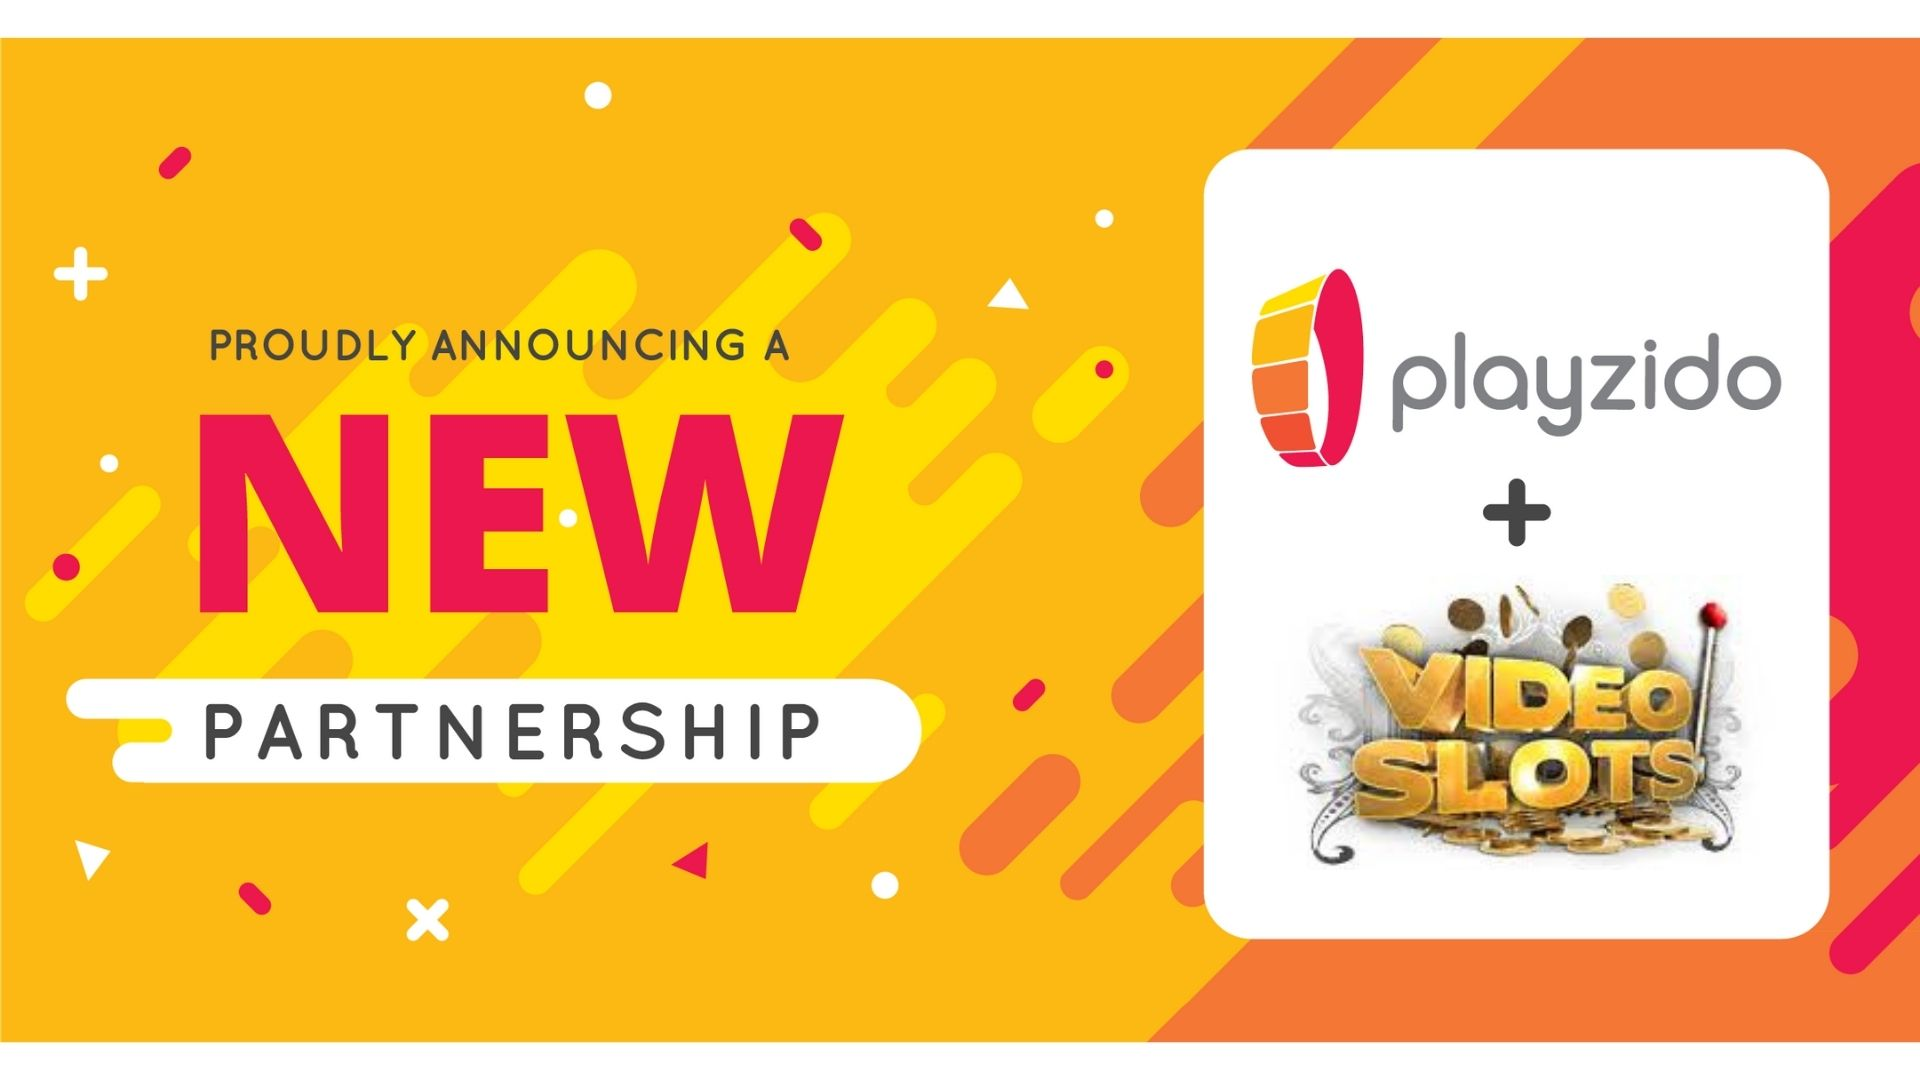 Playzido's portfolio of premium slots launch with online slot giant, Videoslots